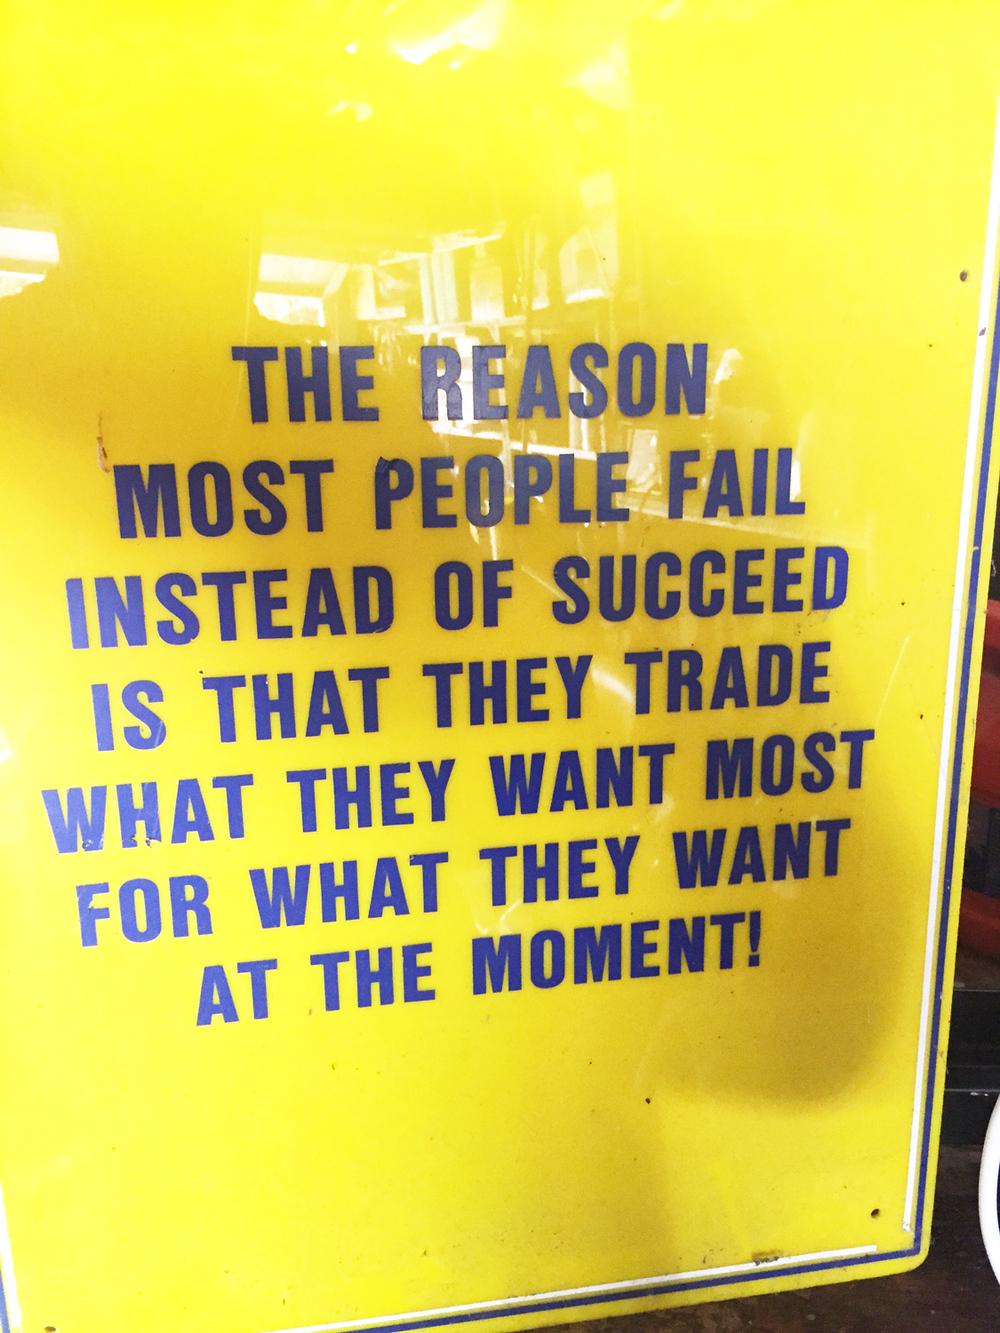 Mr. Viz's original sign that motivated me so much